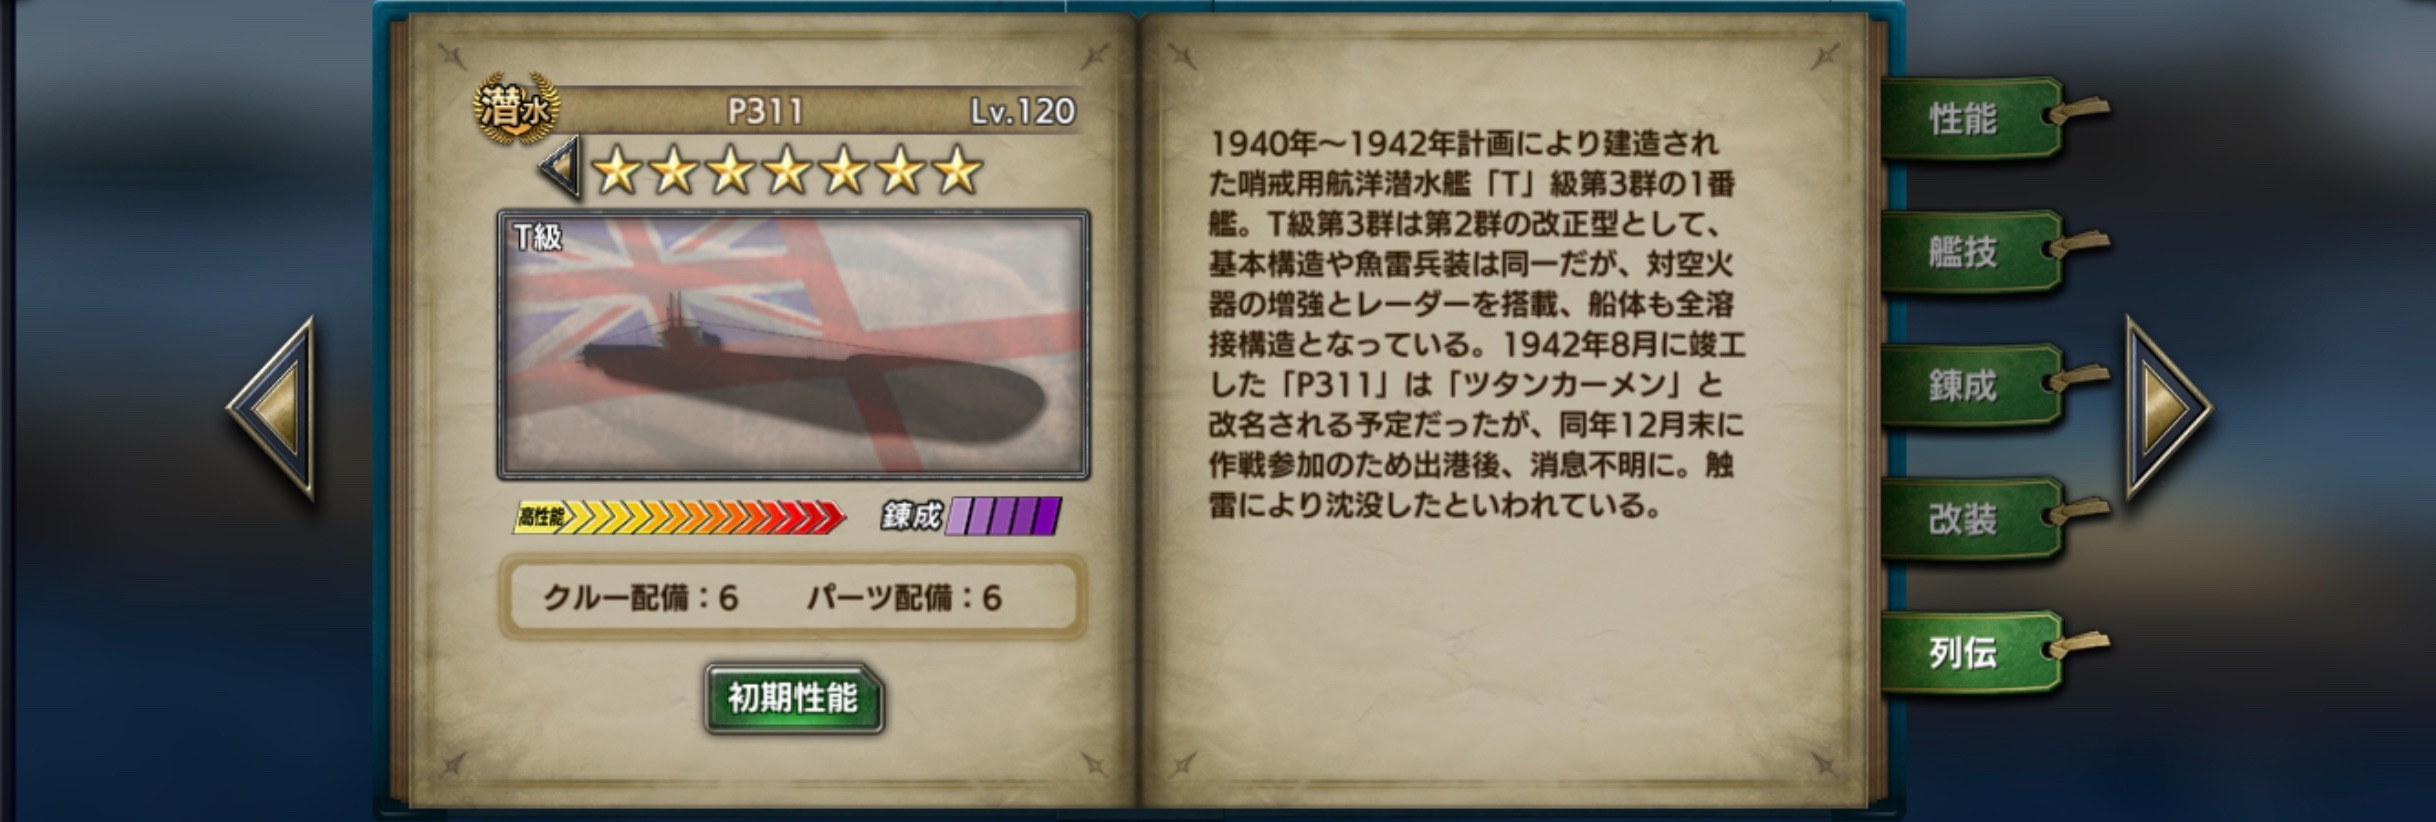 P311-history